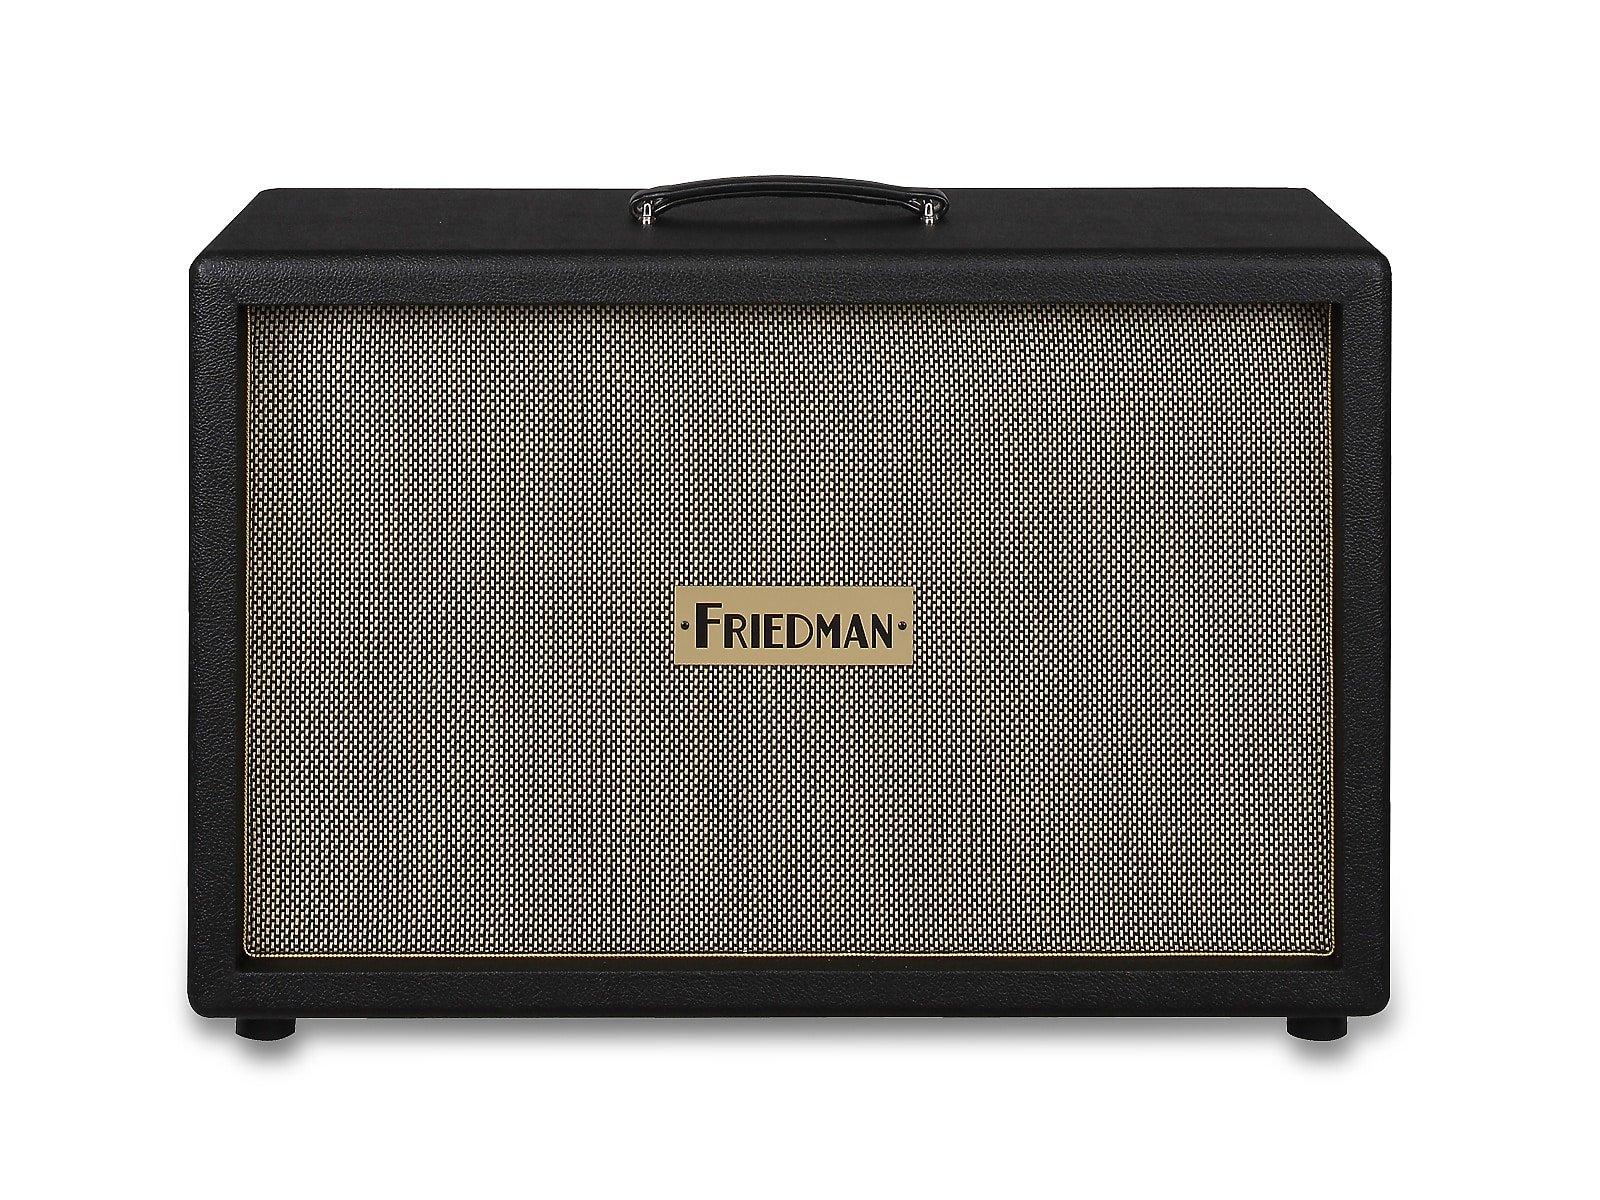 Friedman 212 Vintage